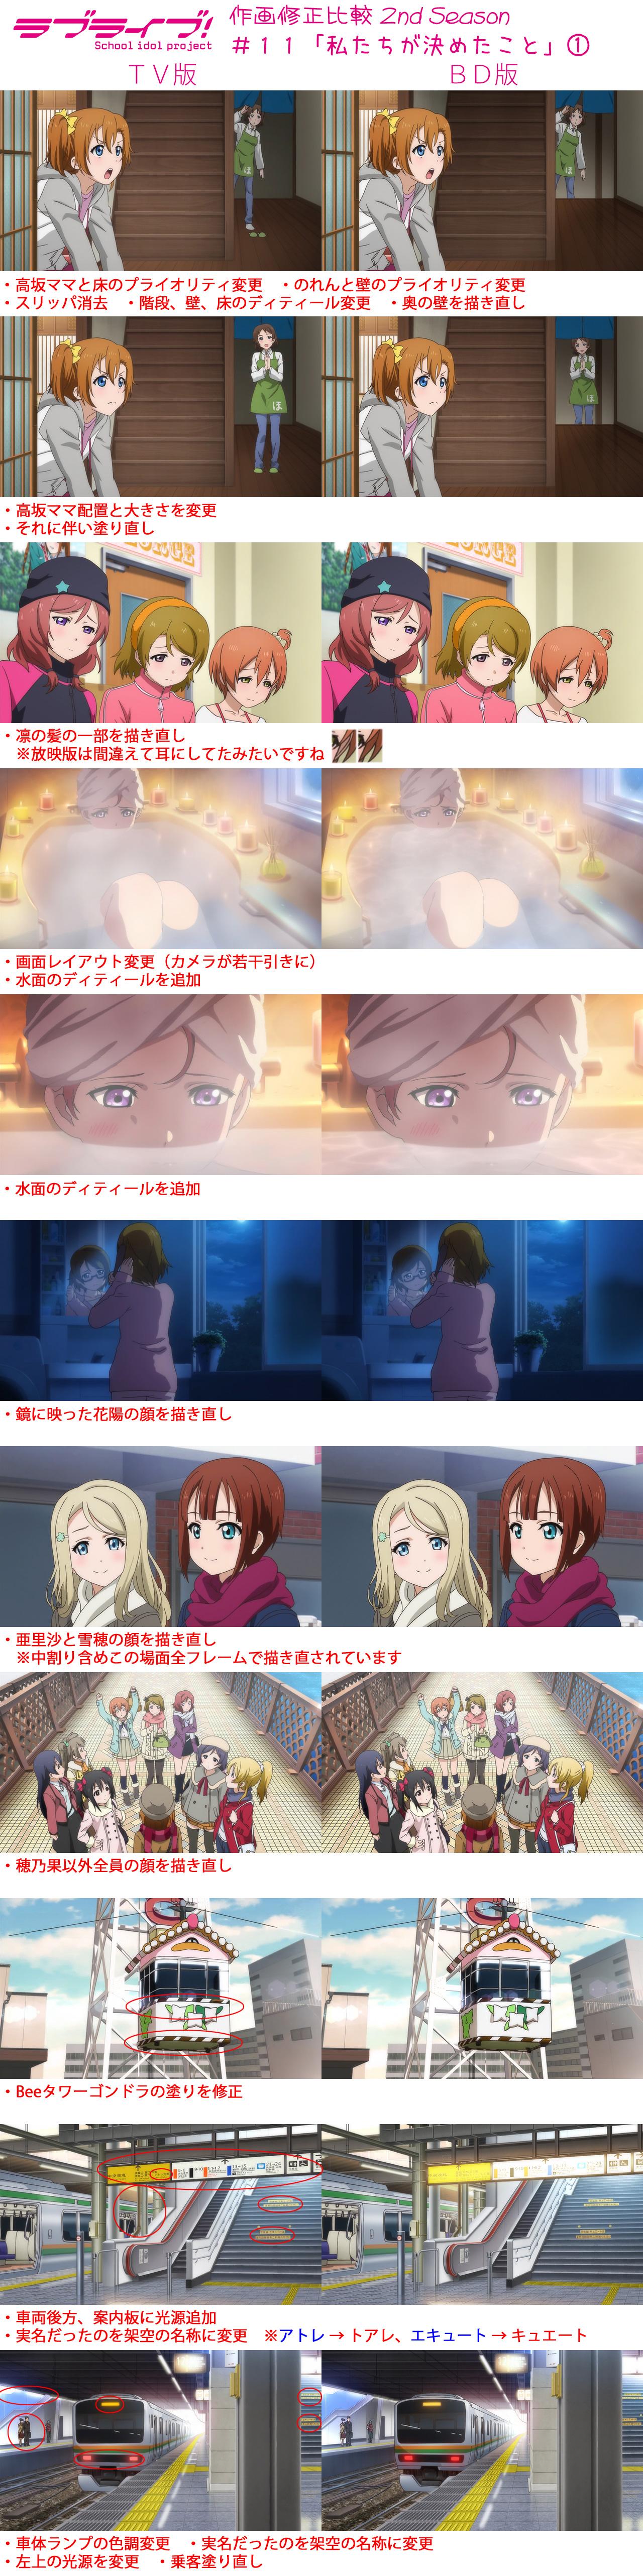 Love-Live!-School-Idol-Project_Haruhichan.com-Season-2-TV-Blu-Ray-Comparison-Episode-11-Part-1